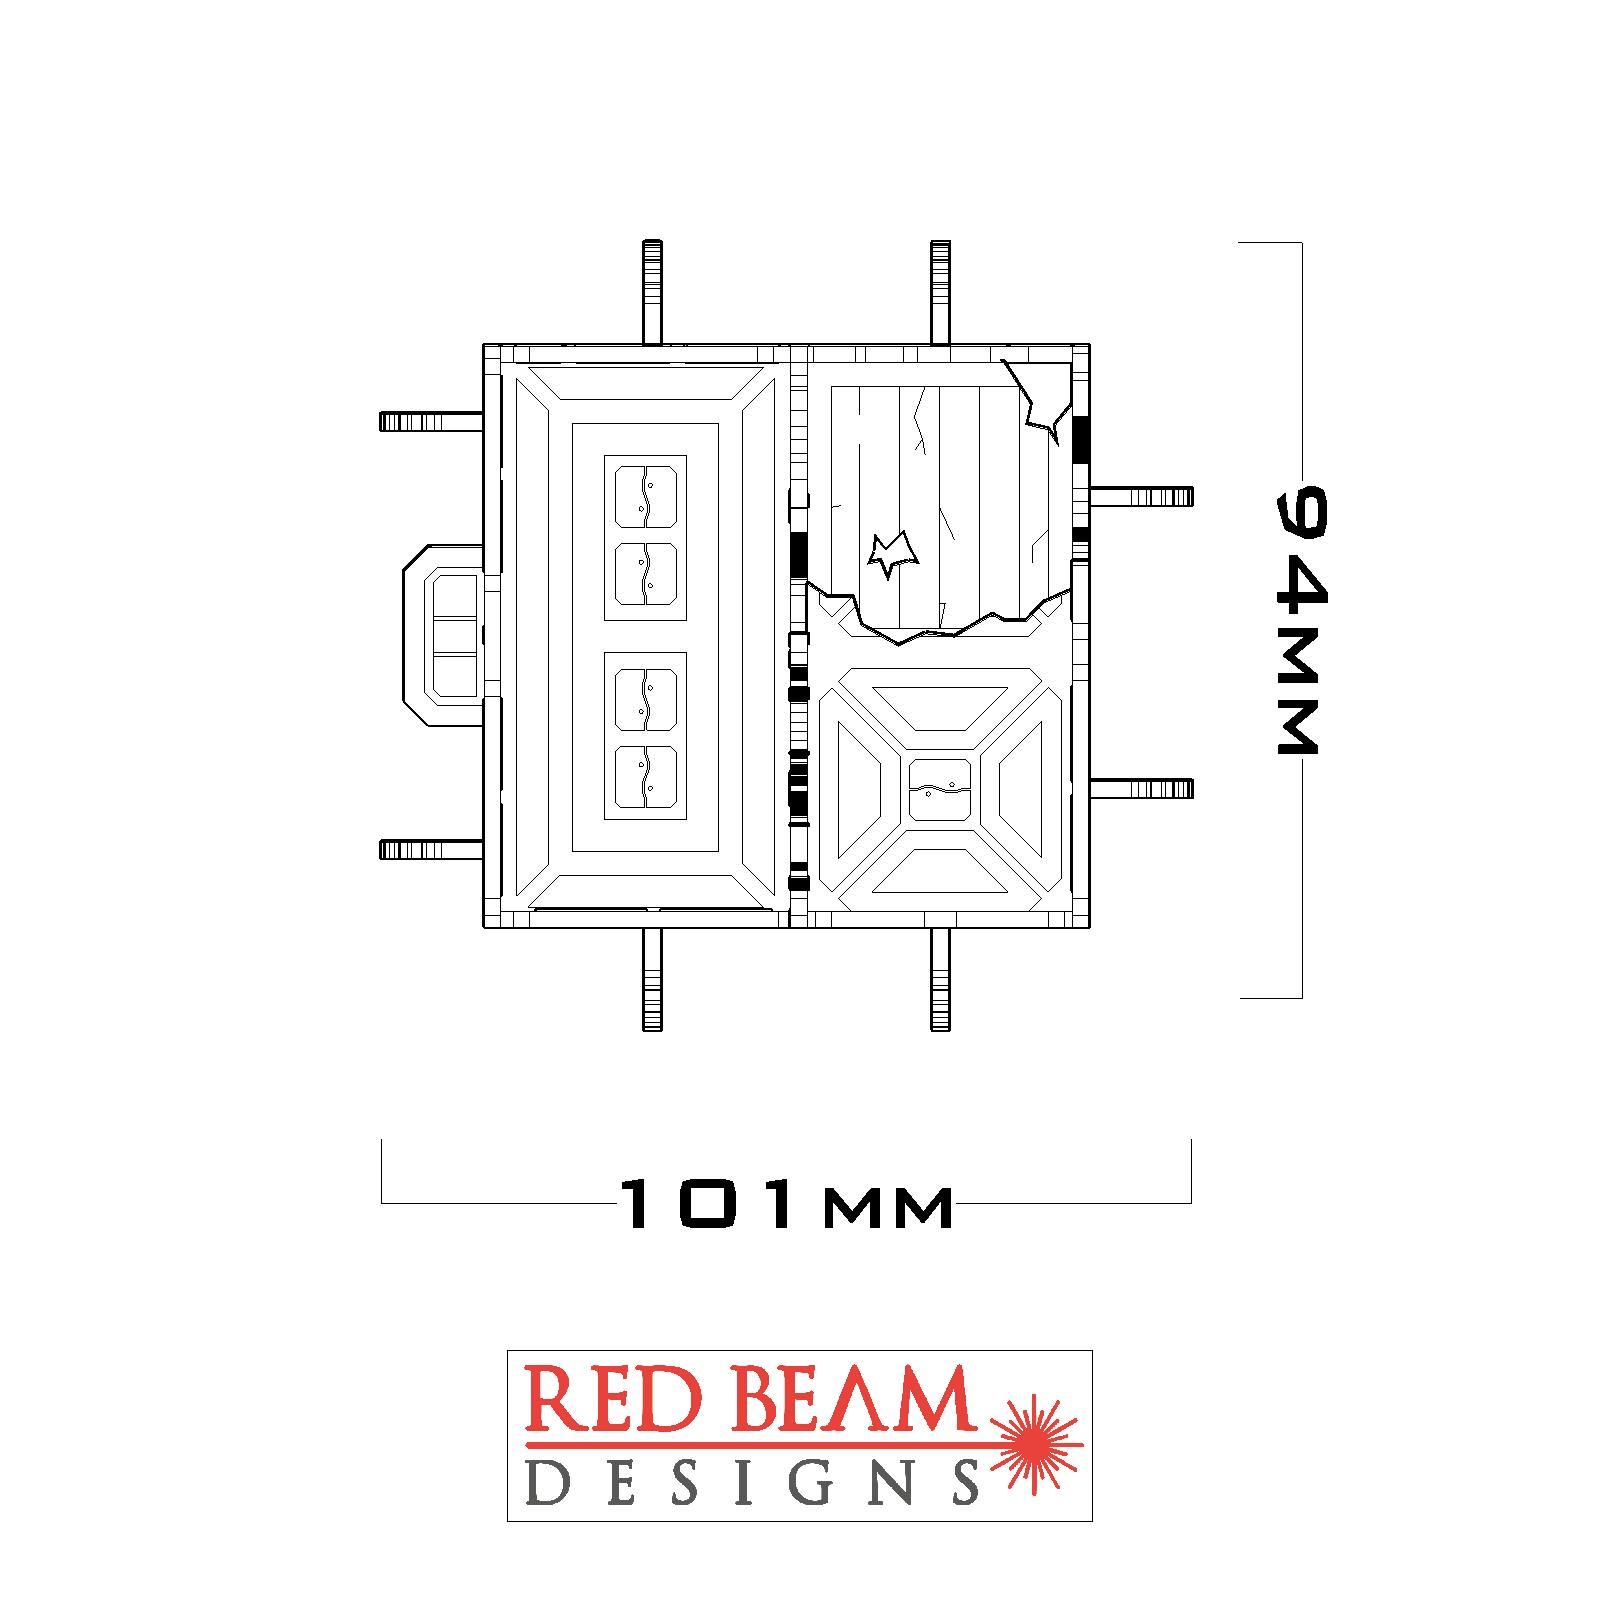 RBD091002_RENDER015.jpg